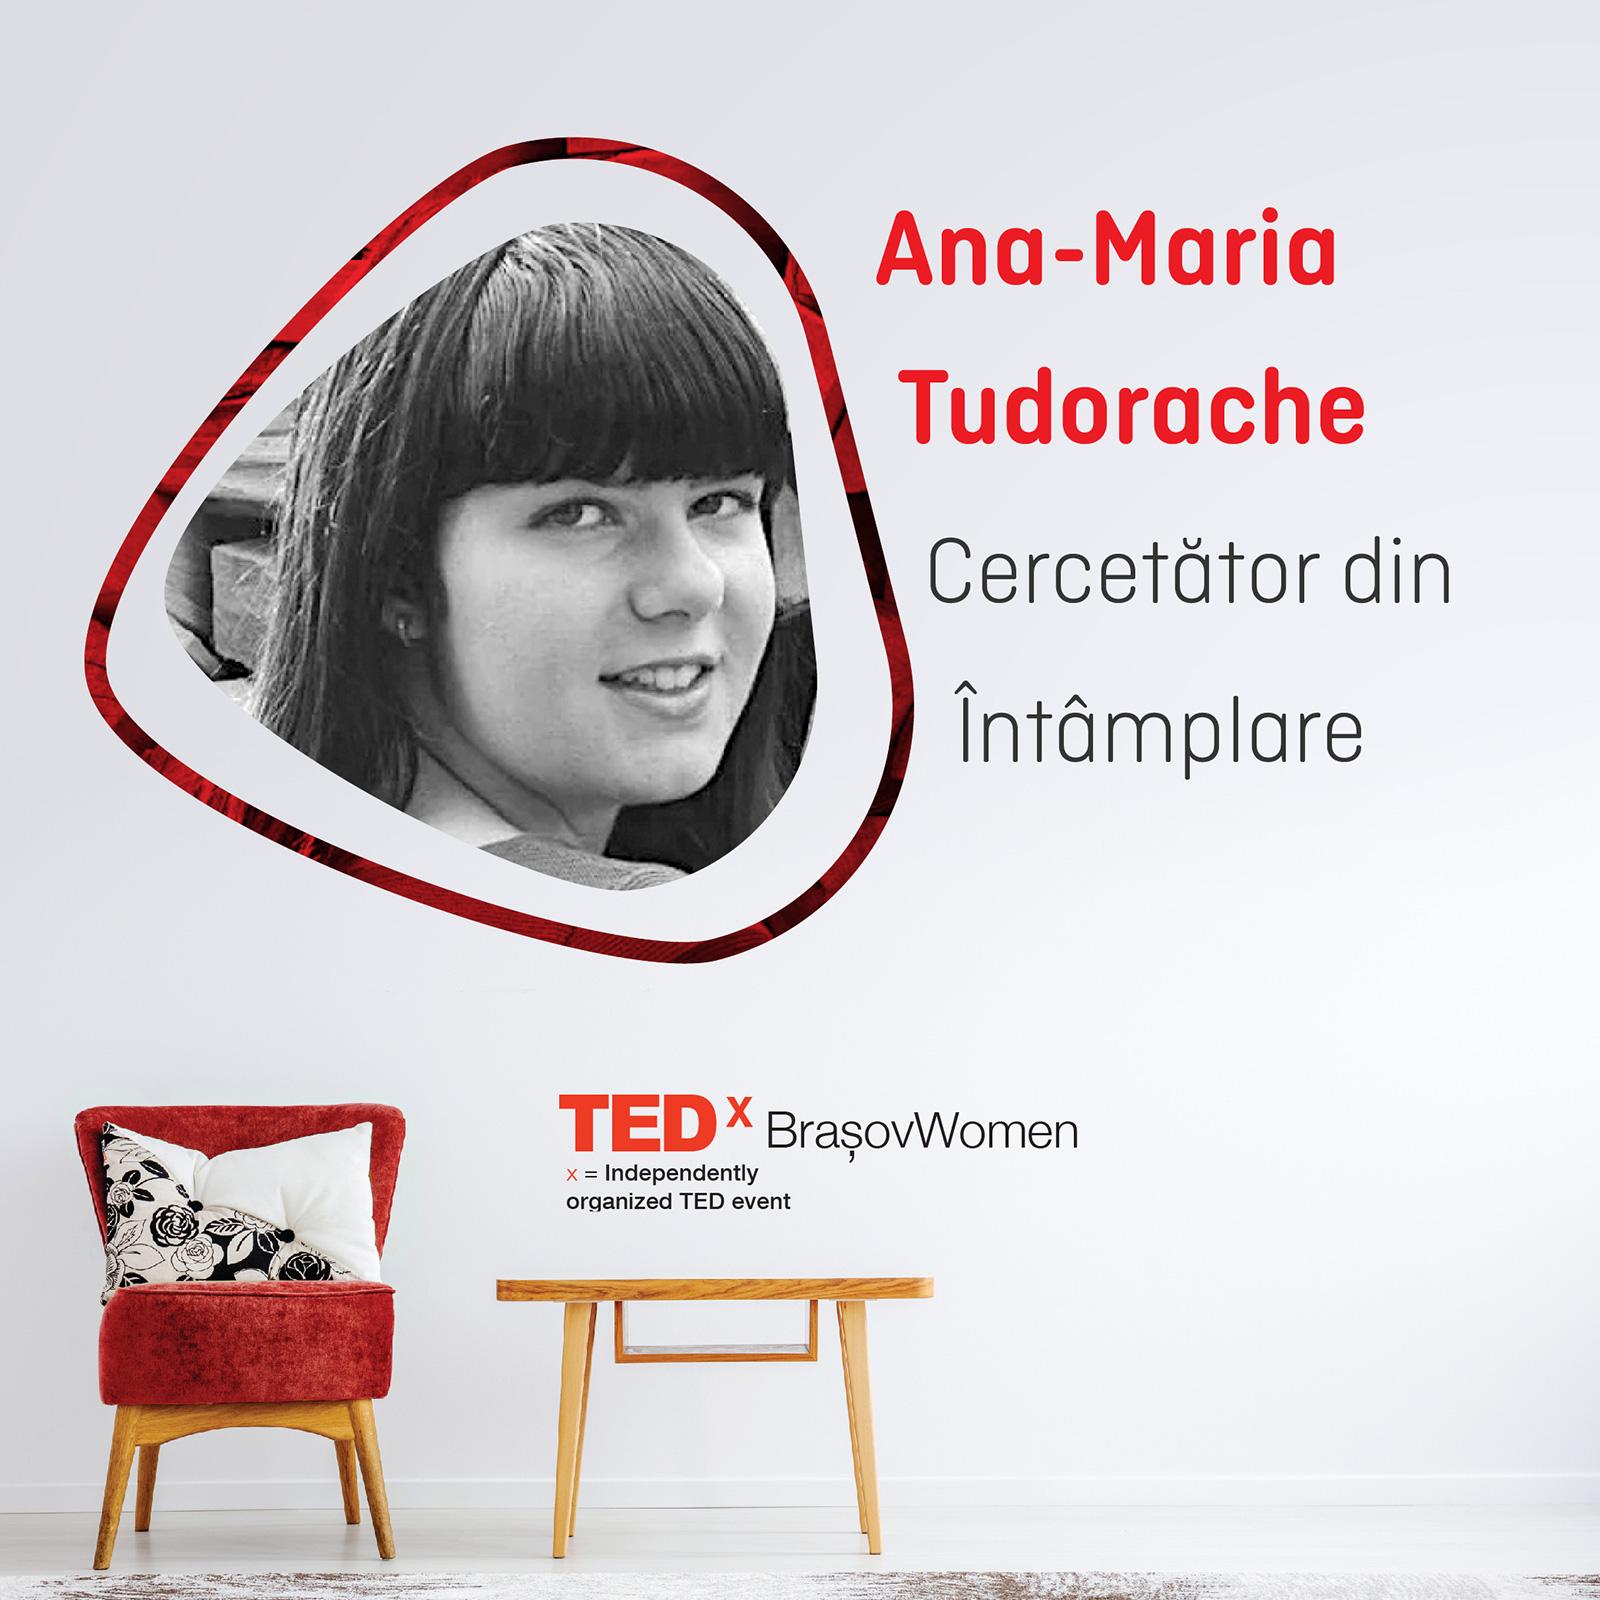 Ana-Maria Tudorache